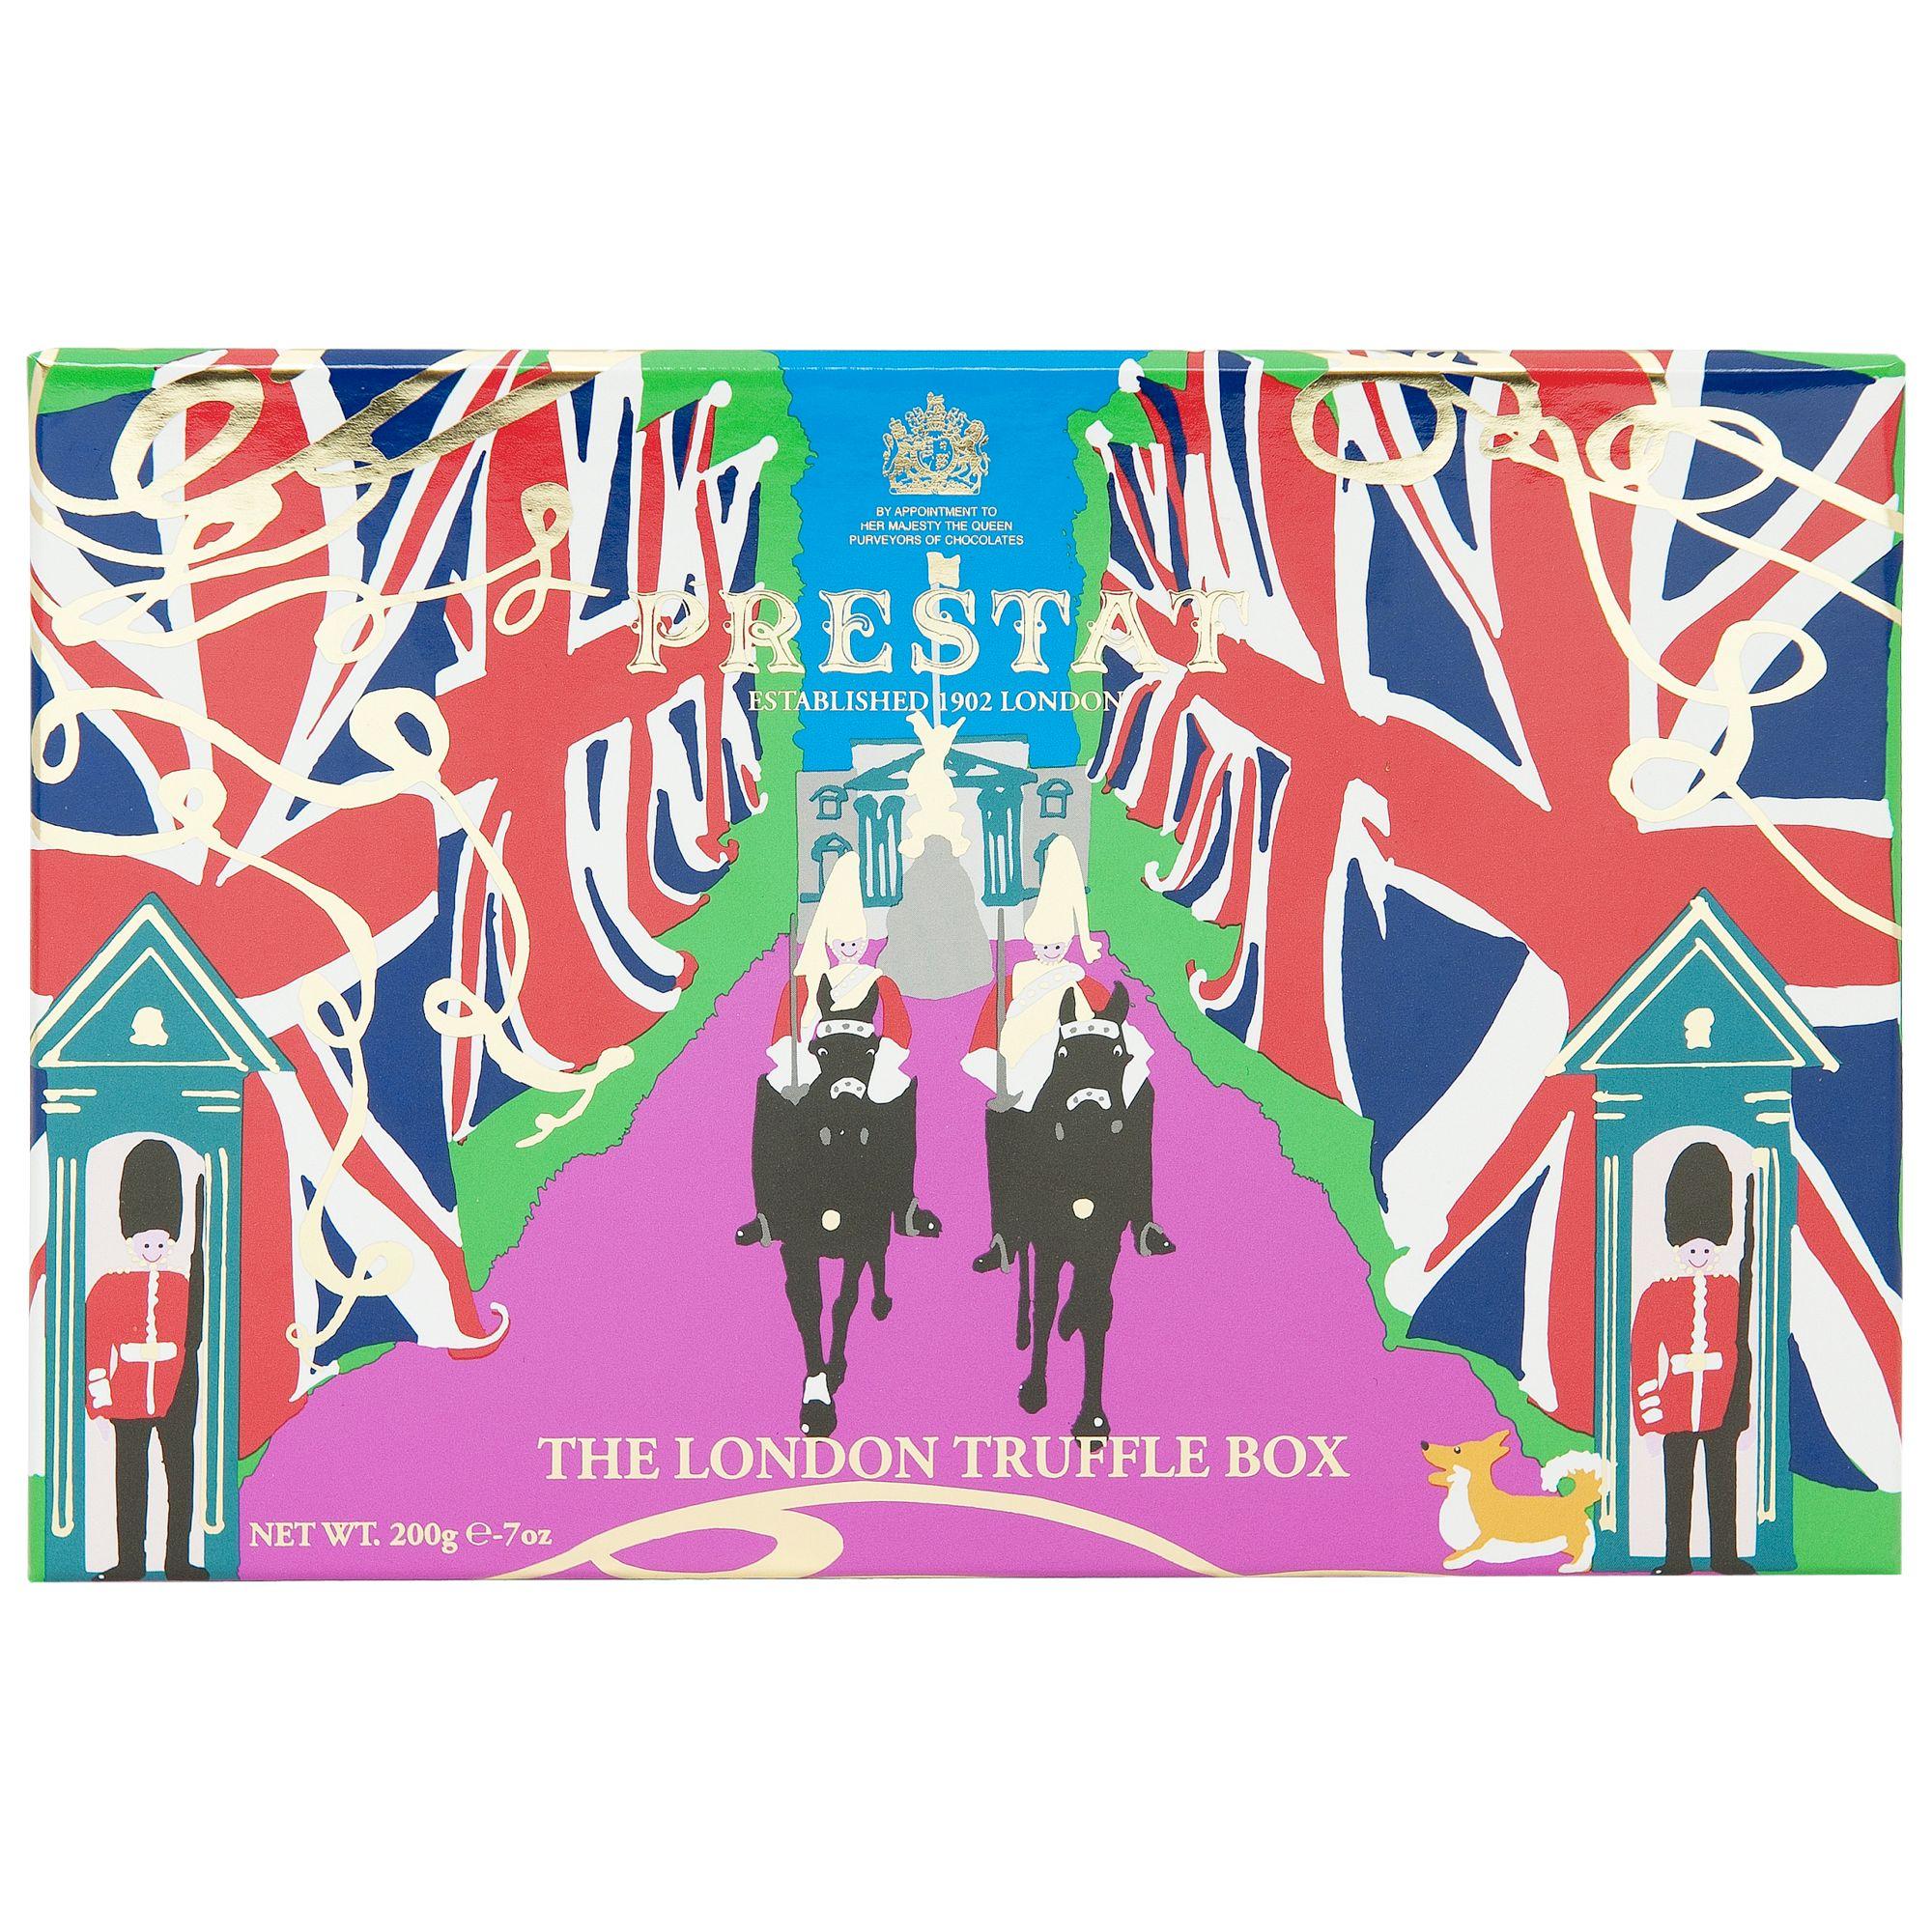 Prestat Prestat, The London Truffle Box, 200g